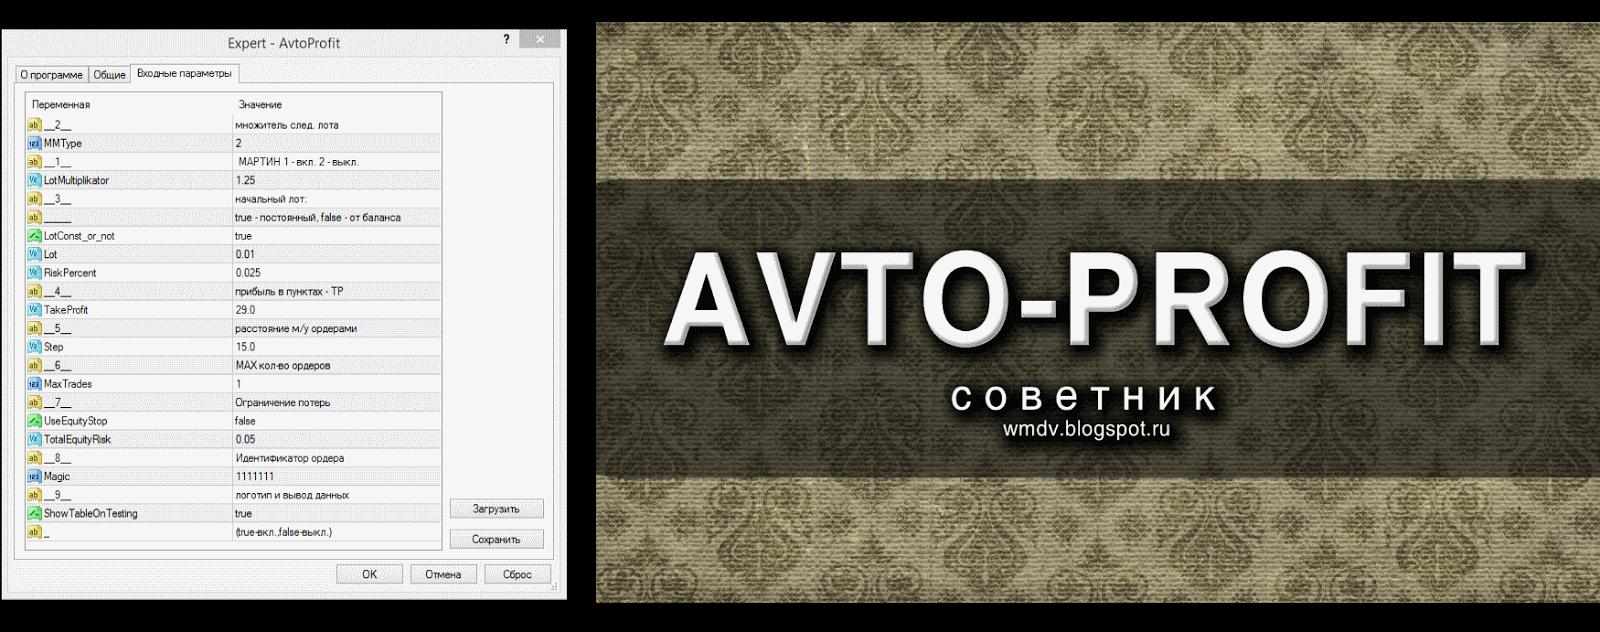 настройки Avto-Profit советника